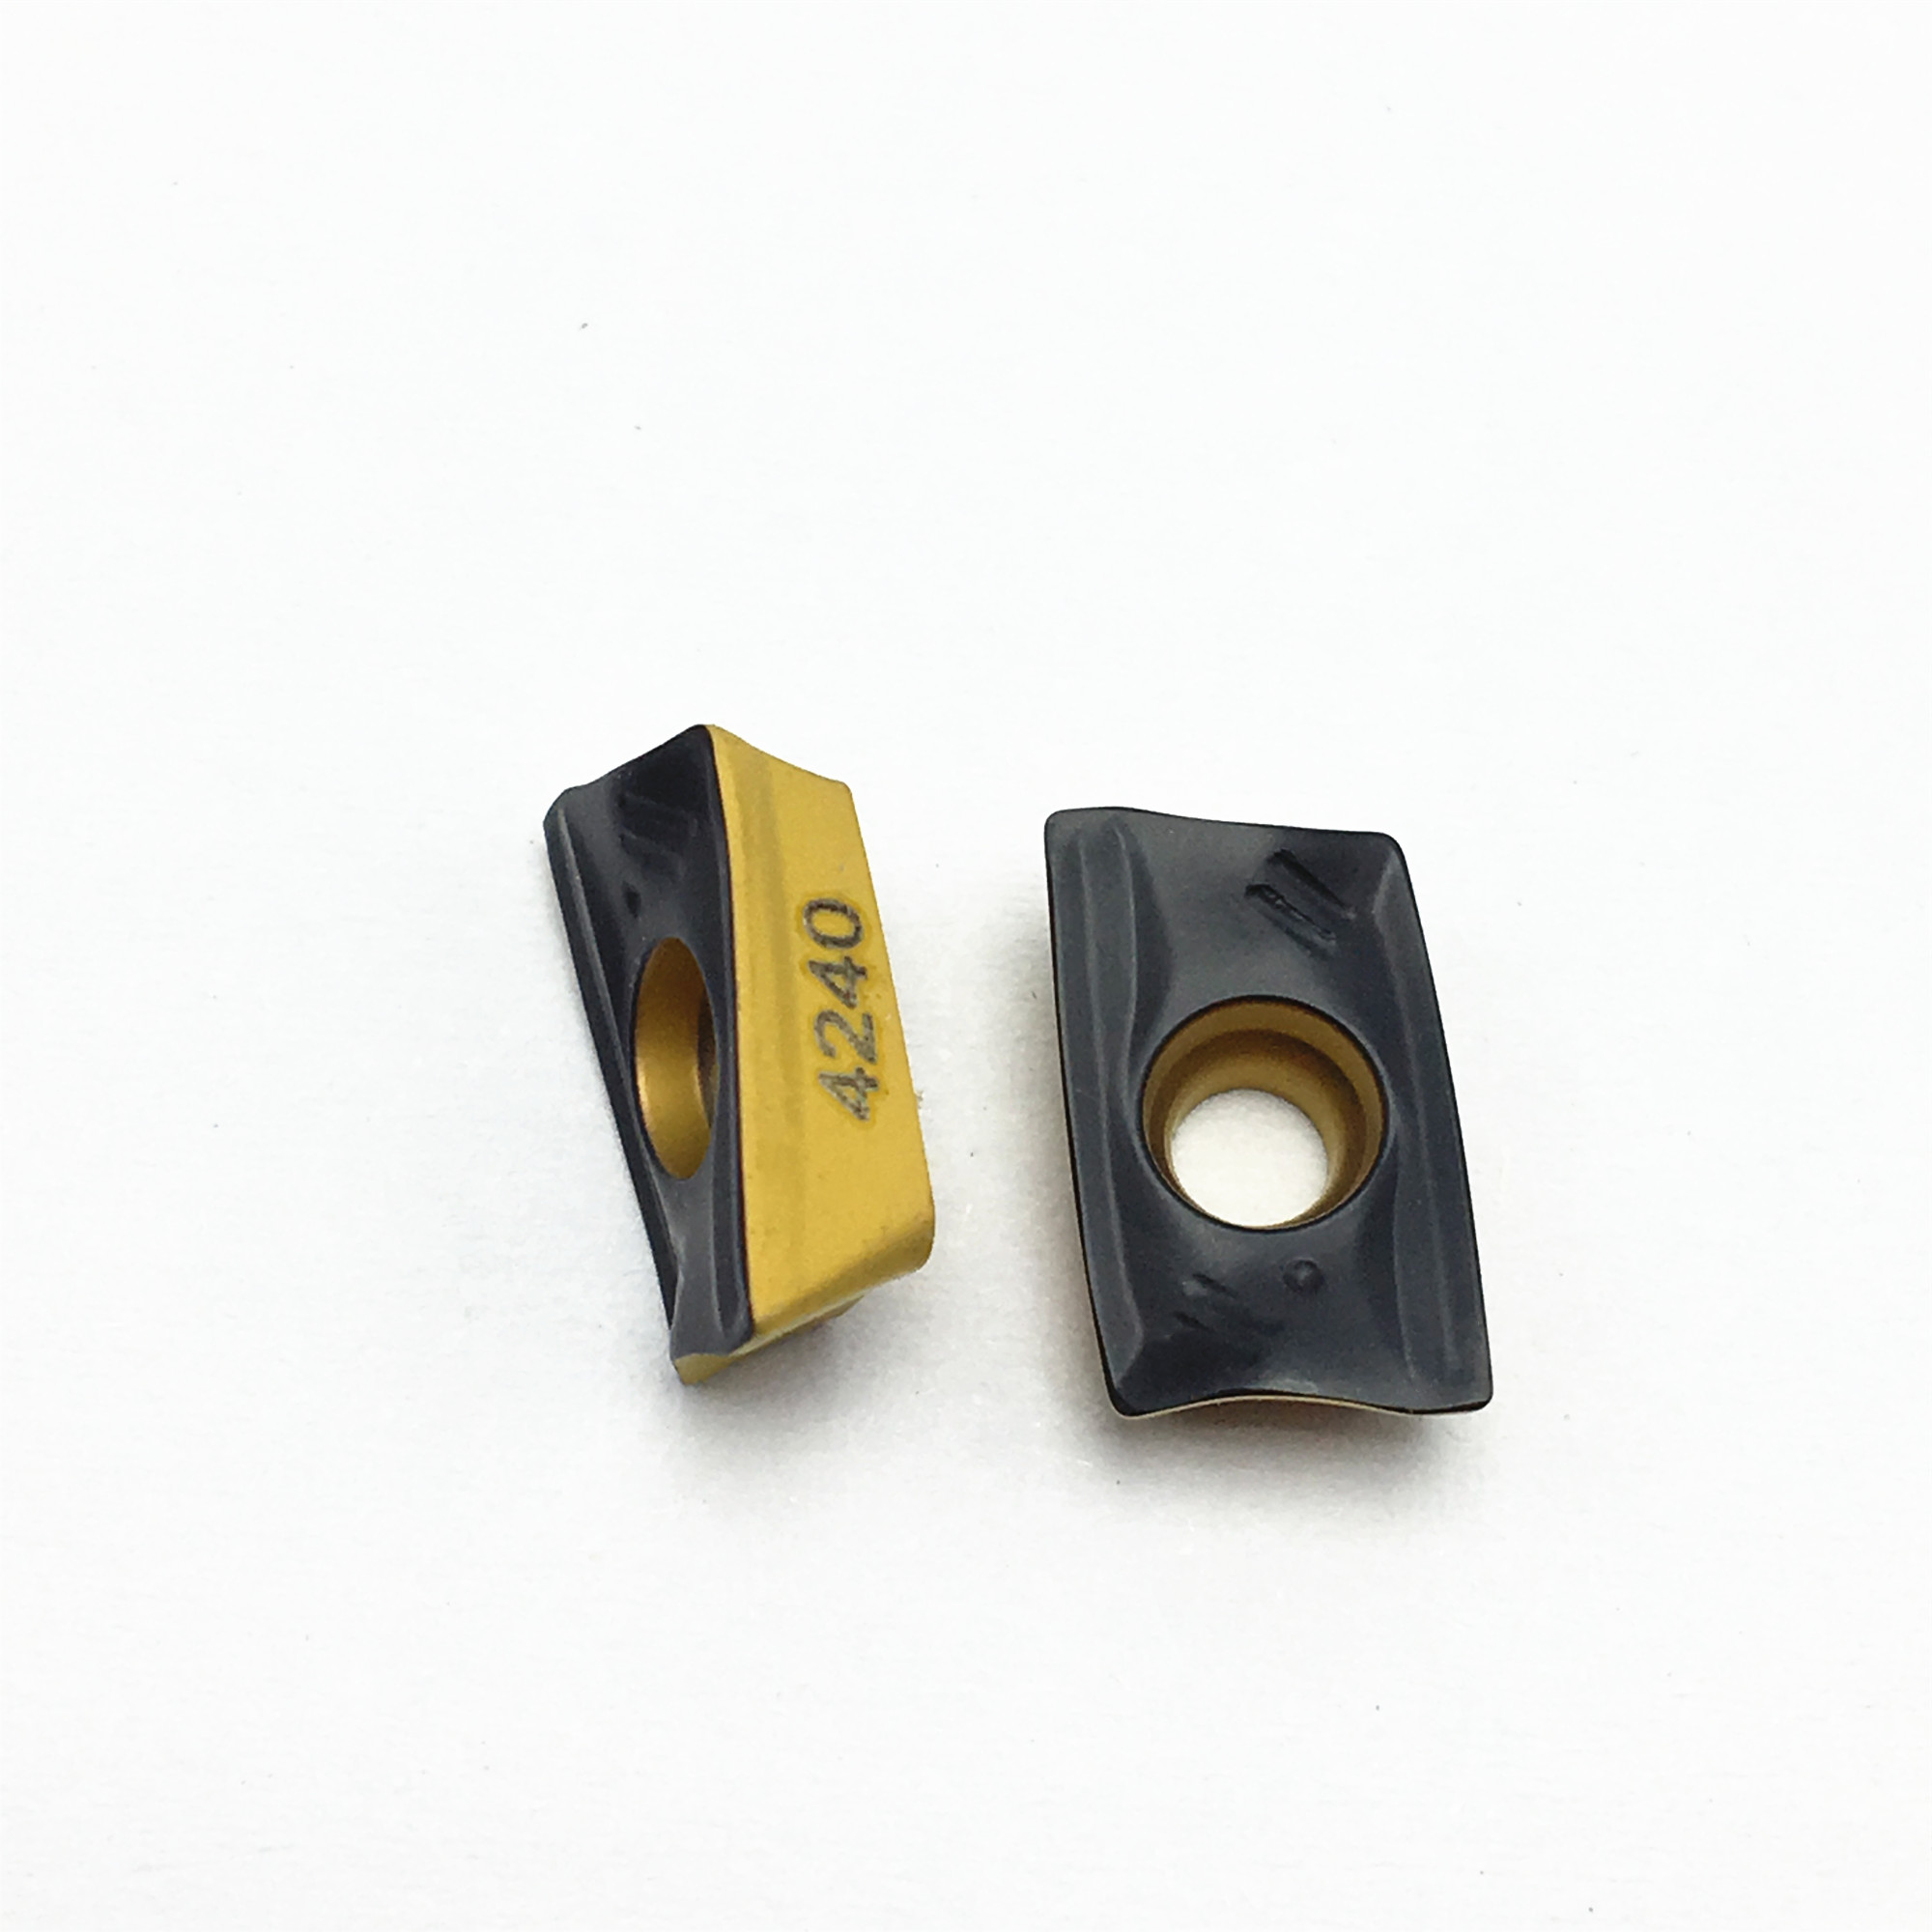 10pcs R390 11T308M-PM Grade 1130 carbide Milling cutting inserts carbide inserts